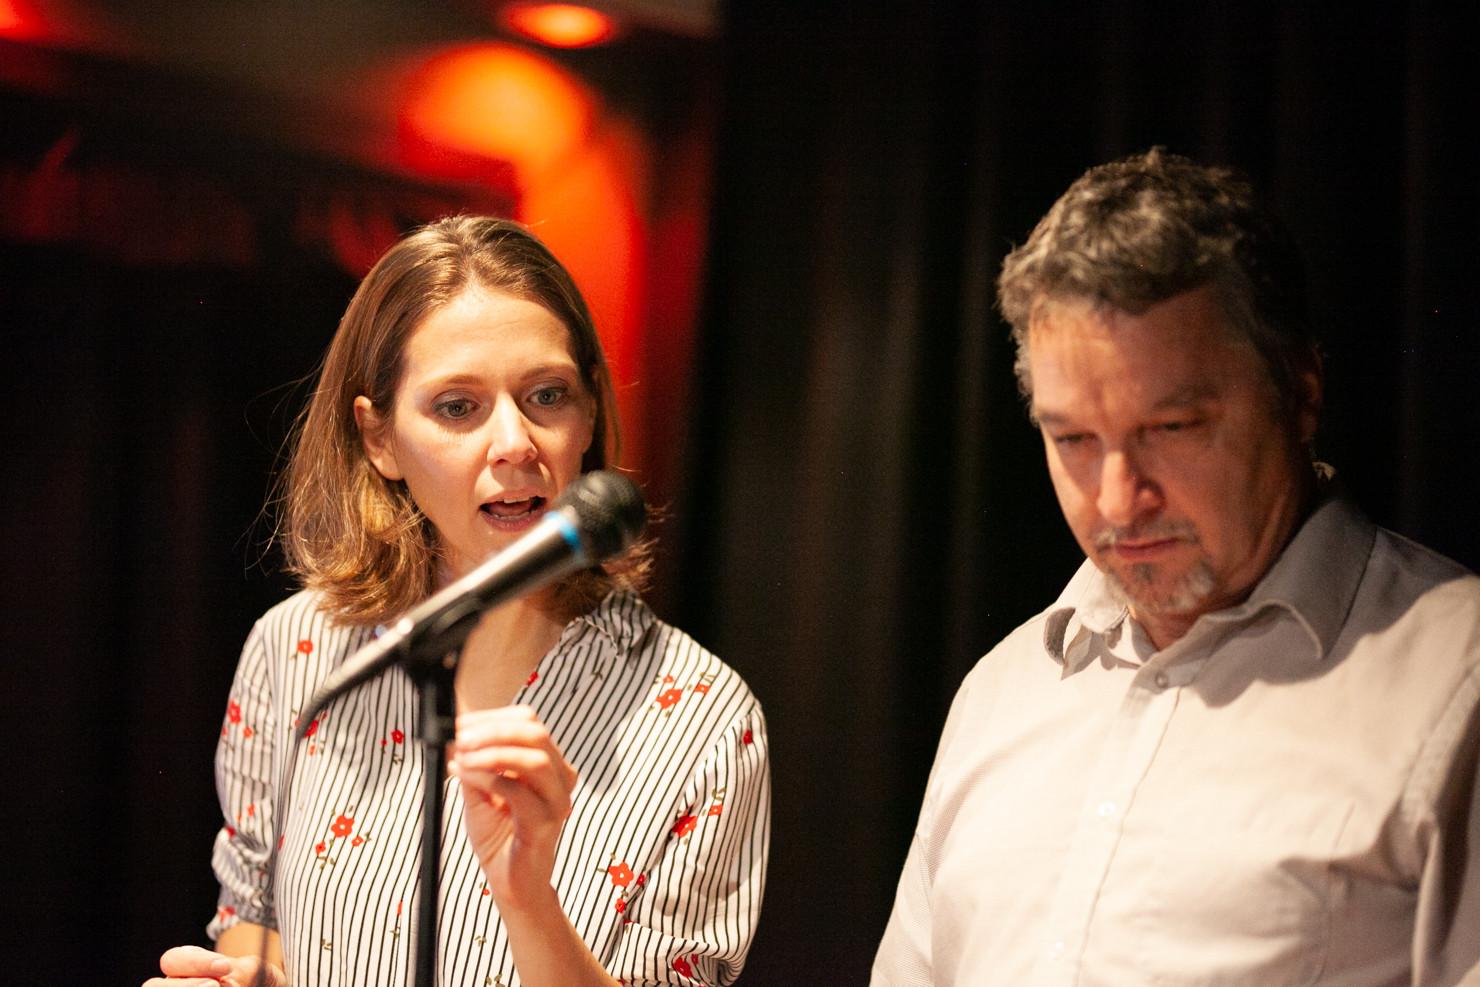 Chantal Blanchard professeur de chant